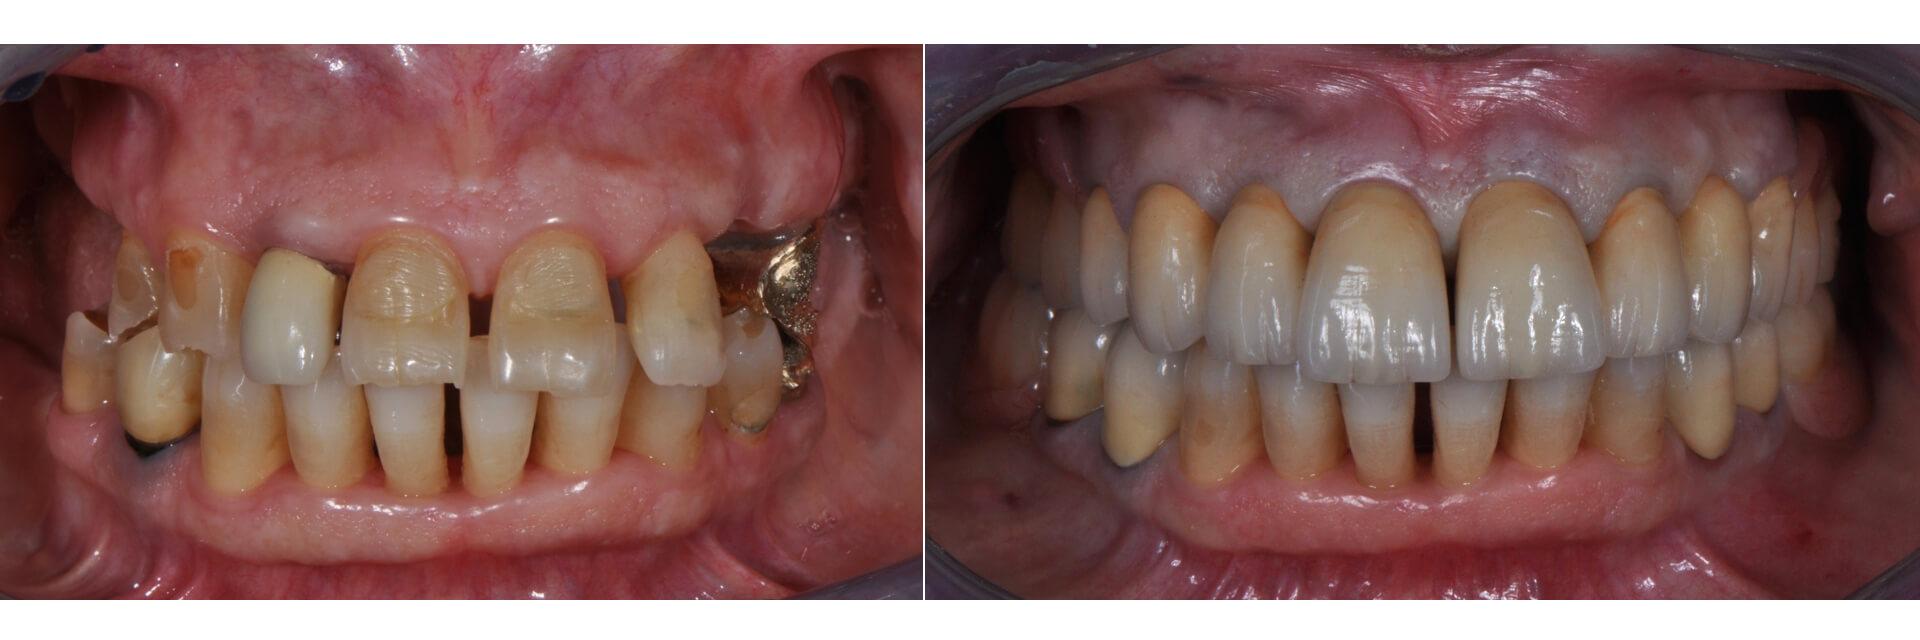 Case 38 | Prosthodontic Award 2015 | Italy